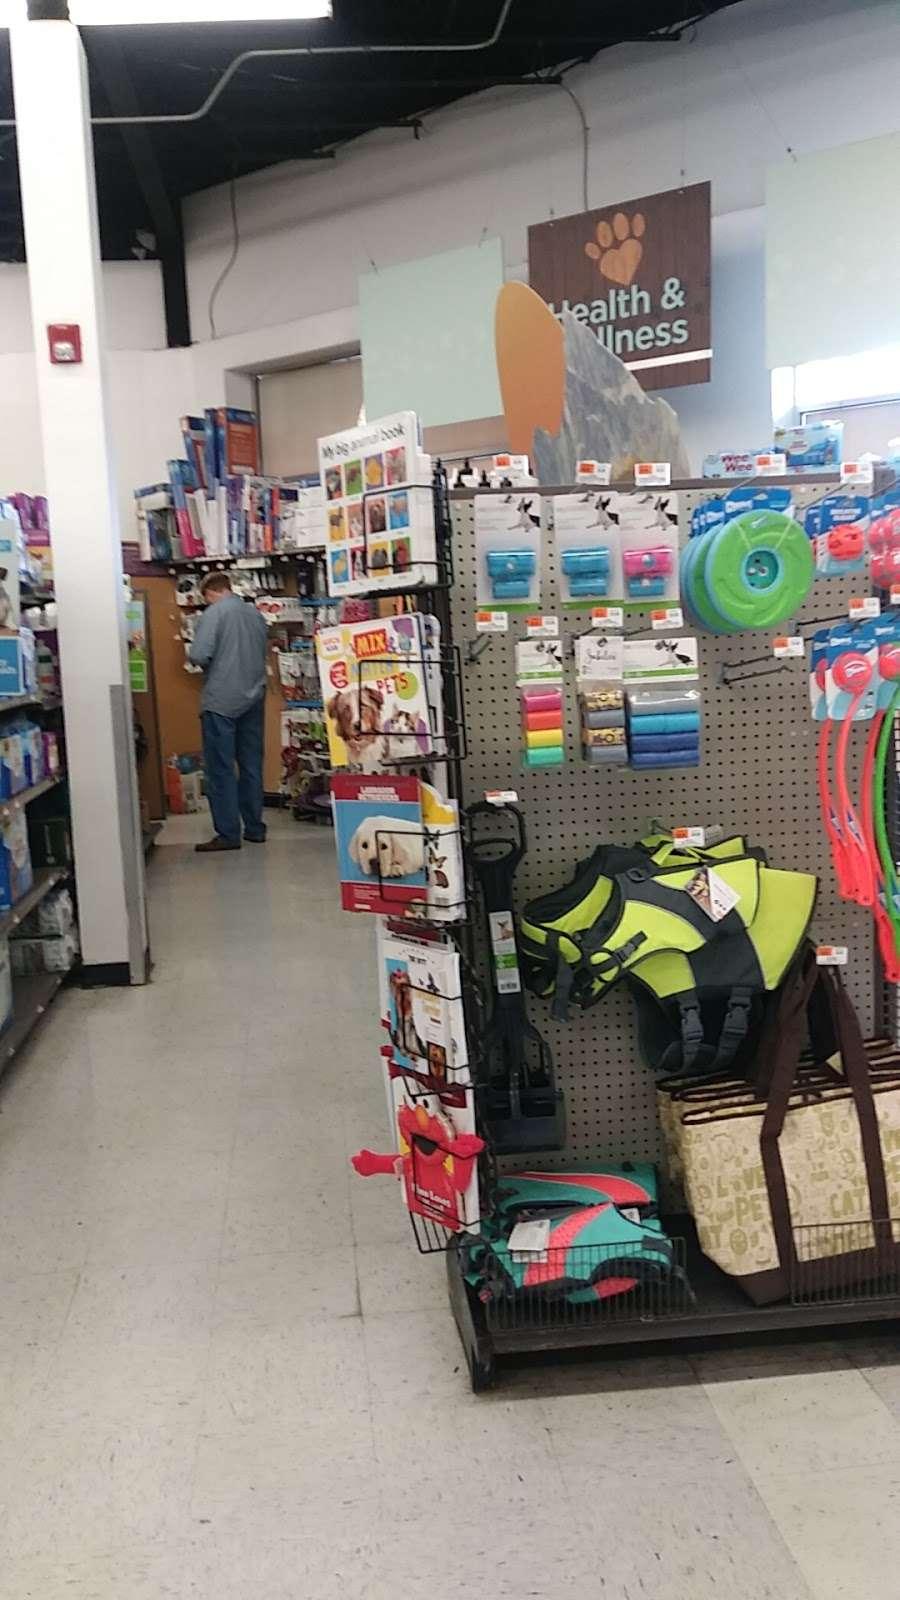 Petco Animal Supplies - store    Photo 9 of 10   Address: 780 Rte 3 West, Clifton, NJ 07012, USA   Phone: (973) 472-3344